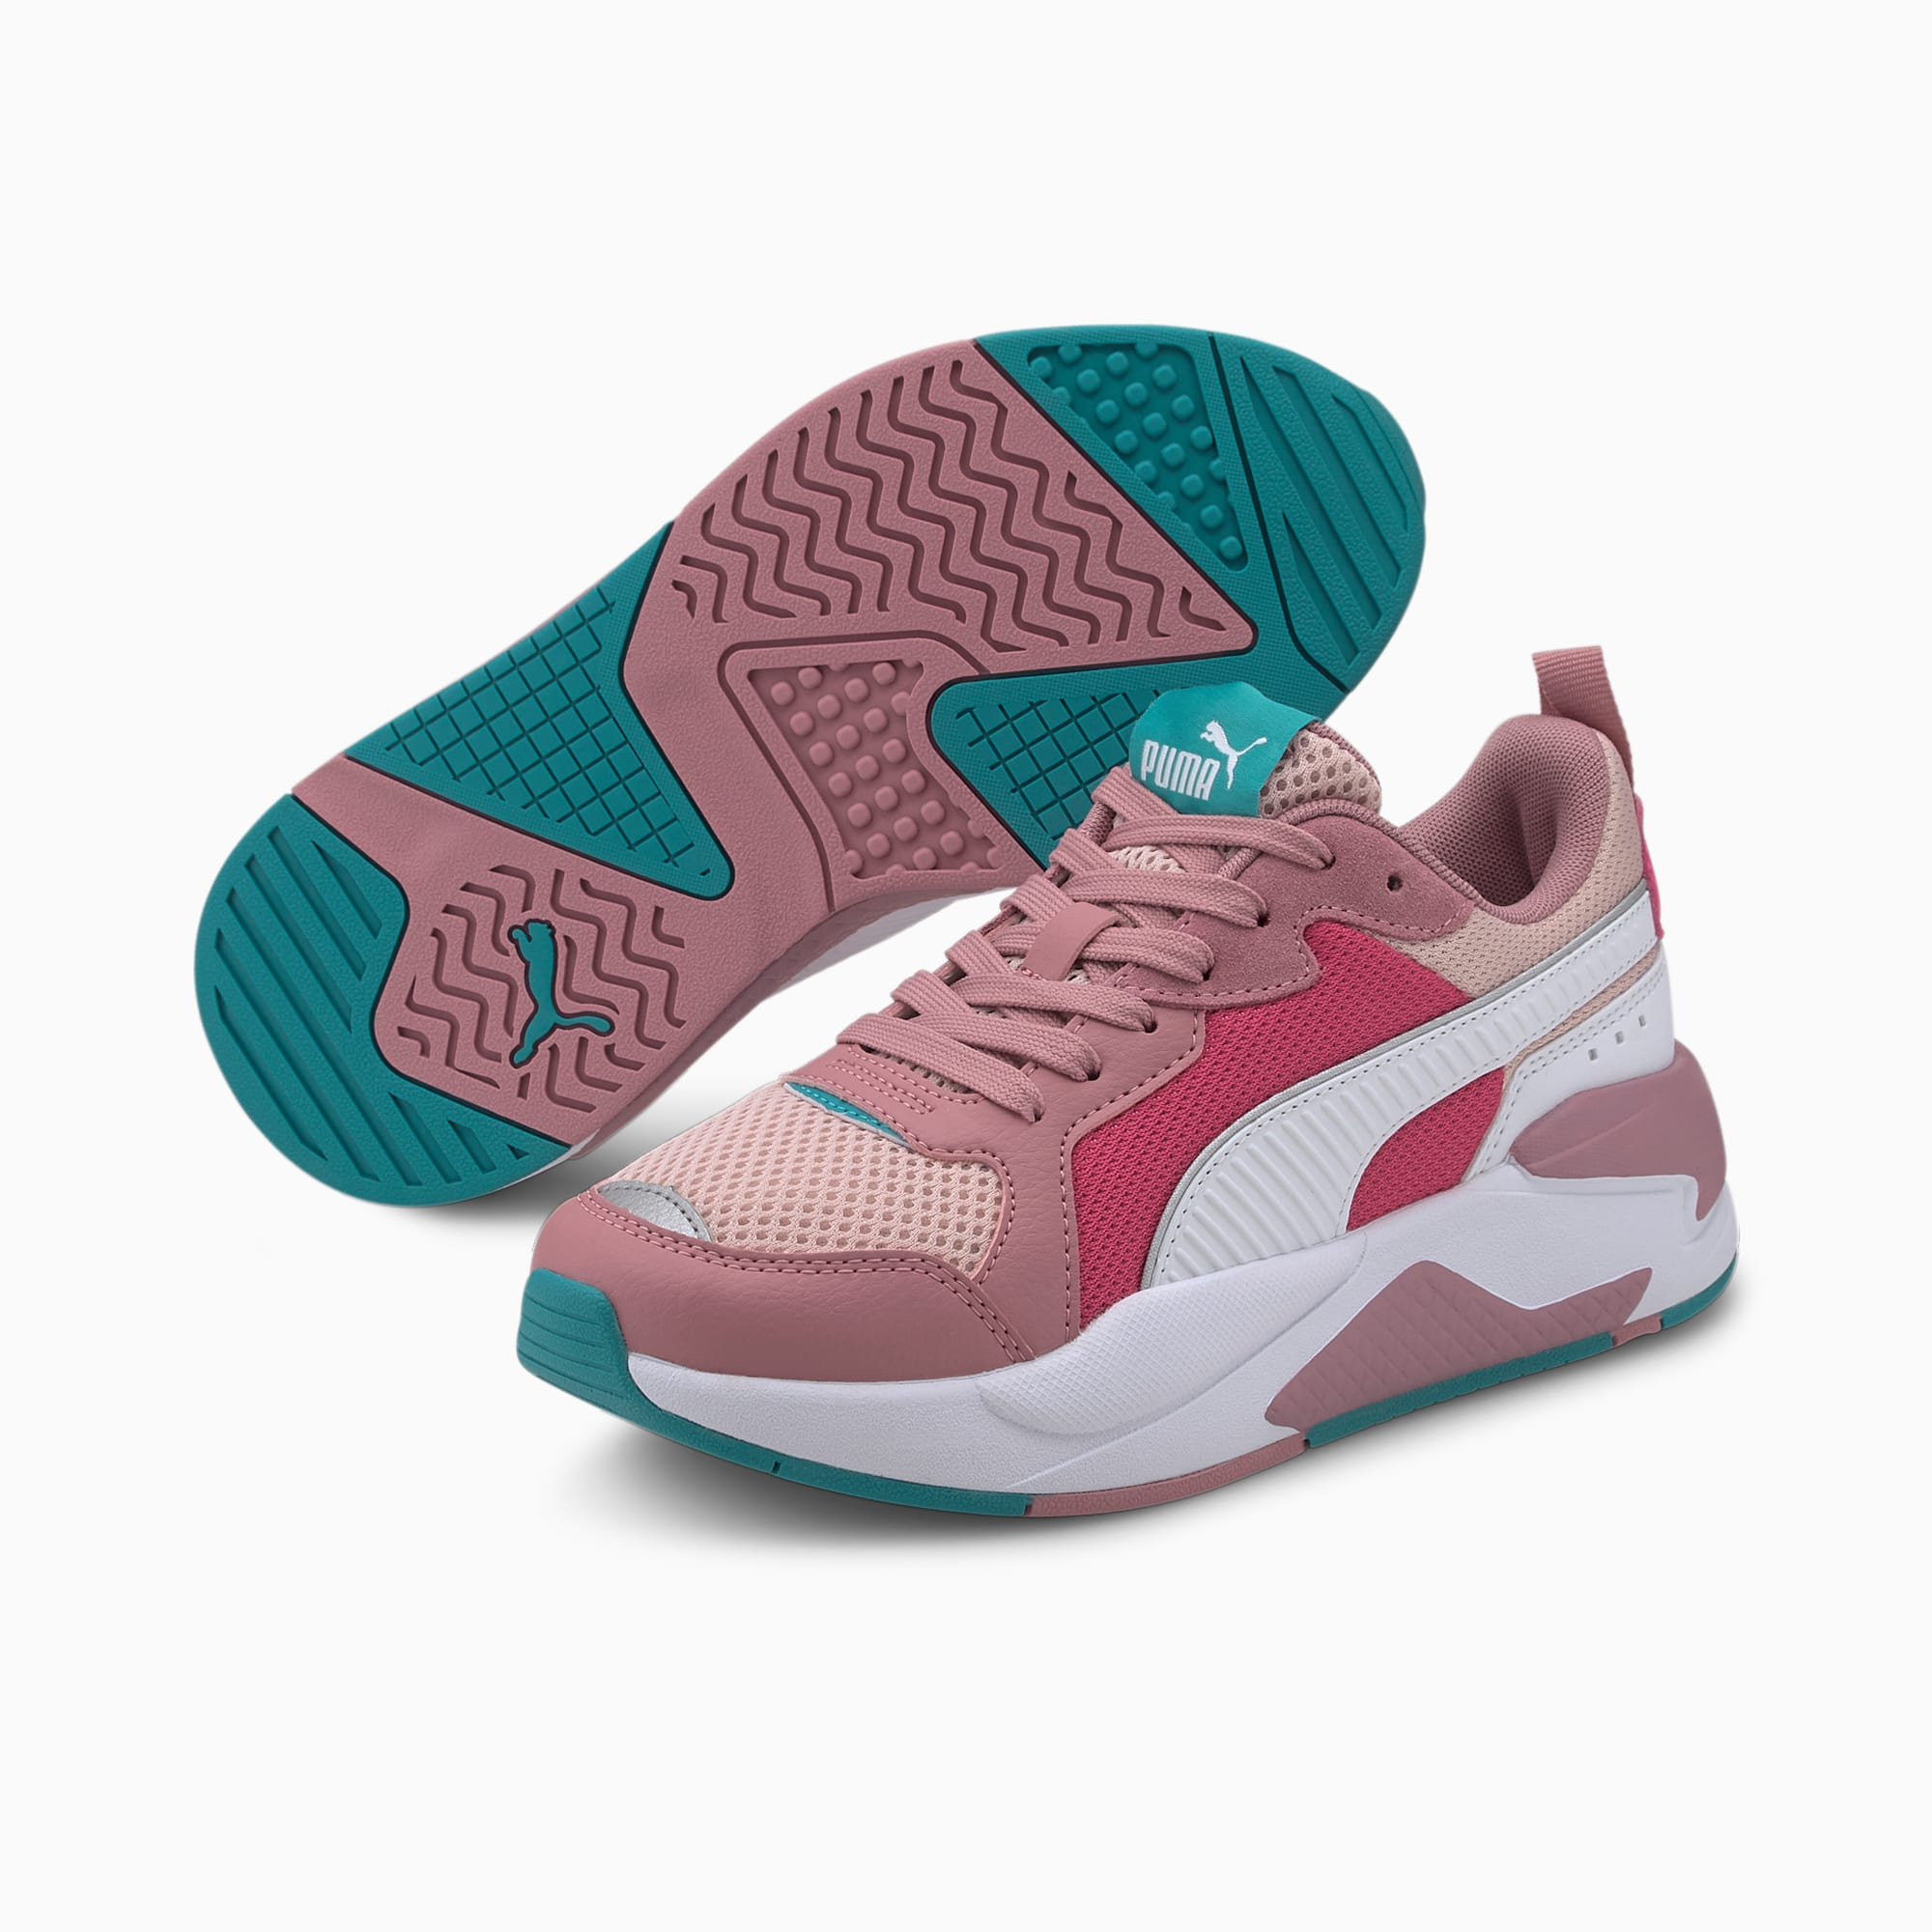 Scarpe da ginnastica X-Ray Youth, Peachskin-Wht-Foxglove-Pink, extralarge